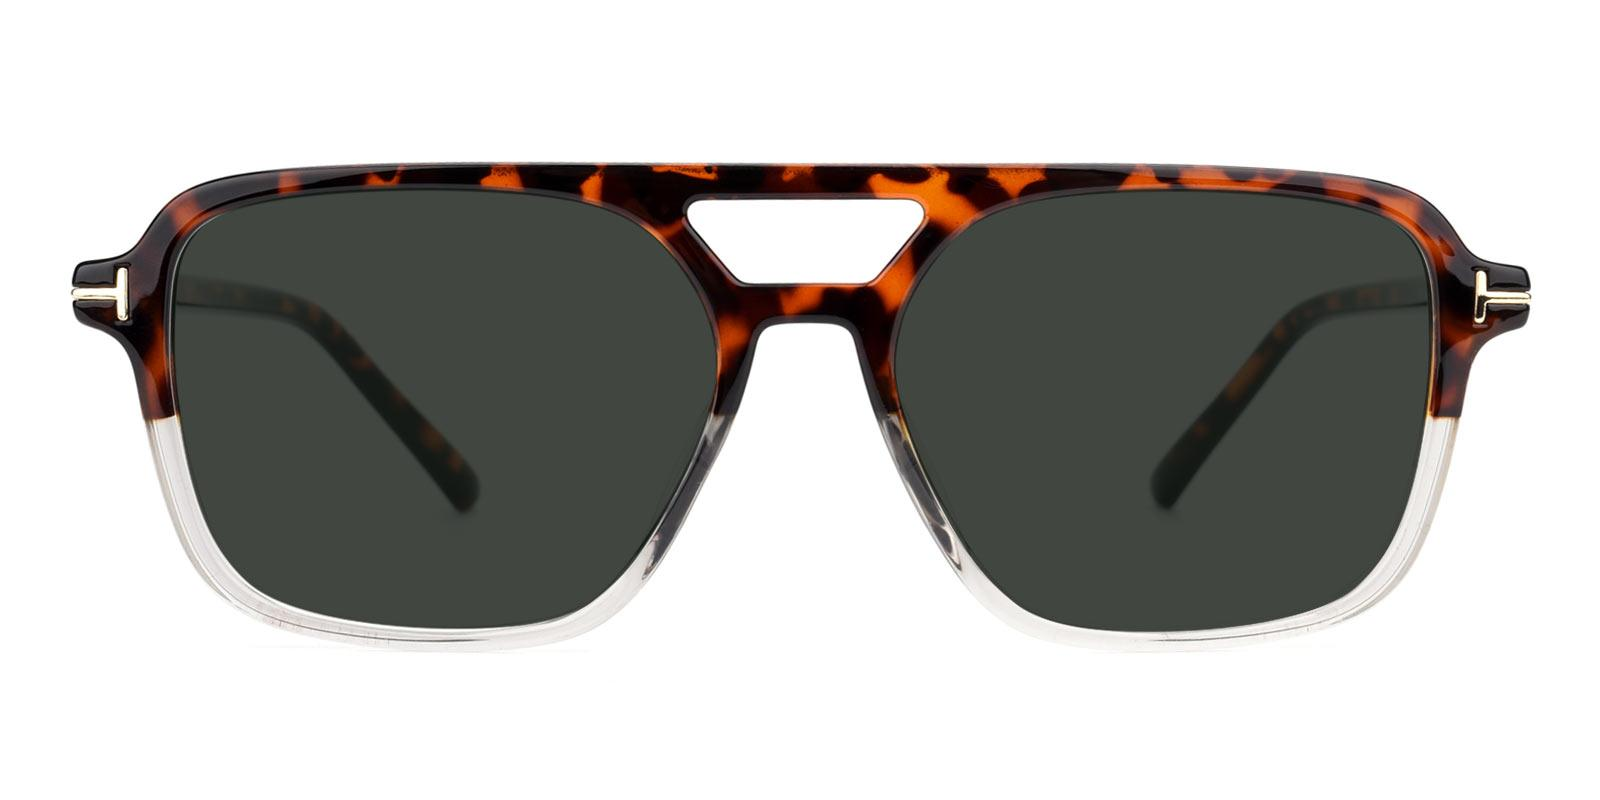 Galaxy-Tortoise-Aviator-TR-Sunglasses-detail